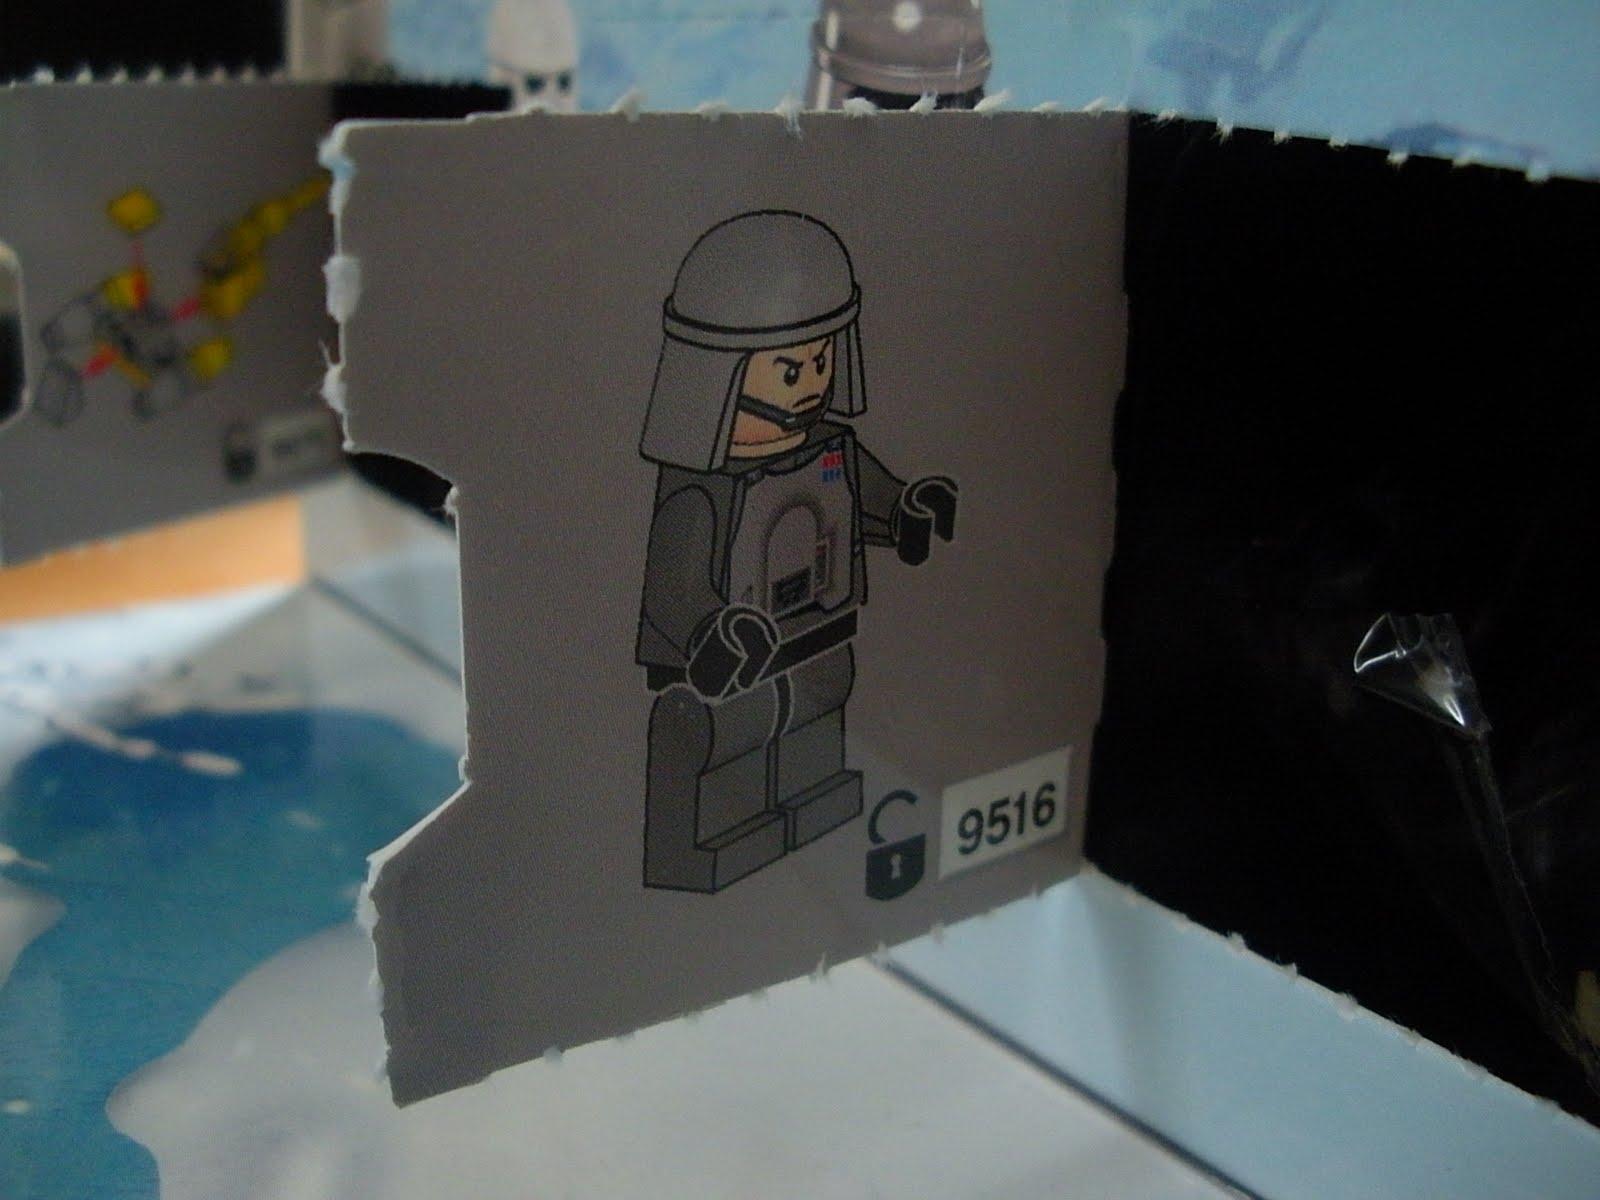 Lego Star Wars Advent Calendar Codes | Template Calendar Printable inside Lego Star Wars Advent Calendar Code